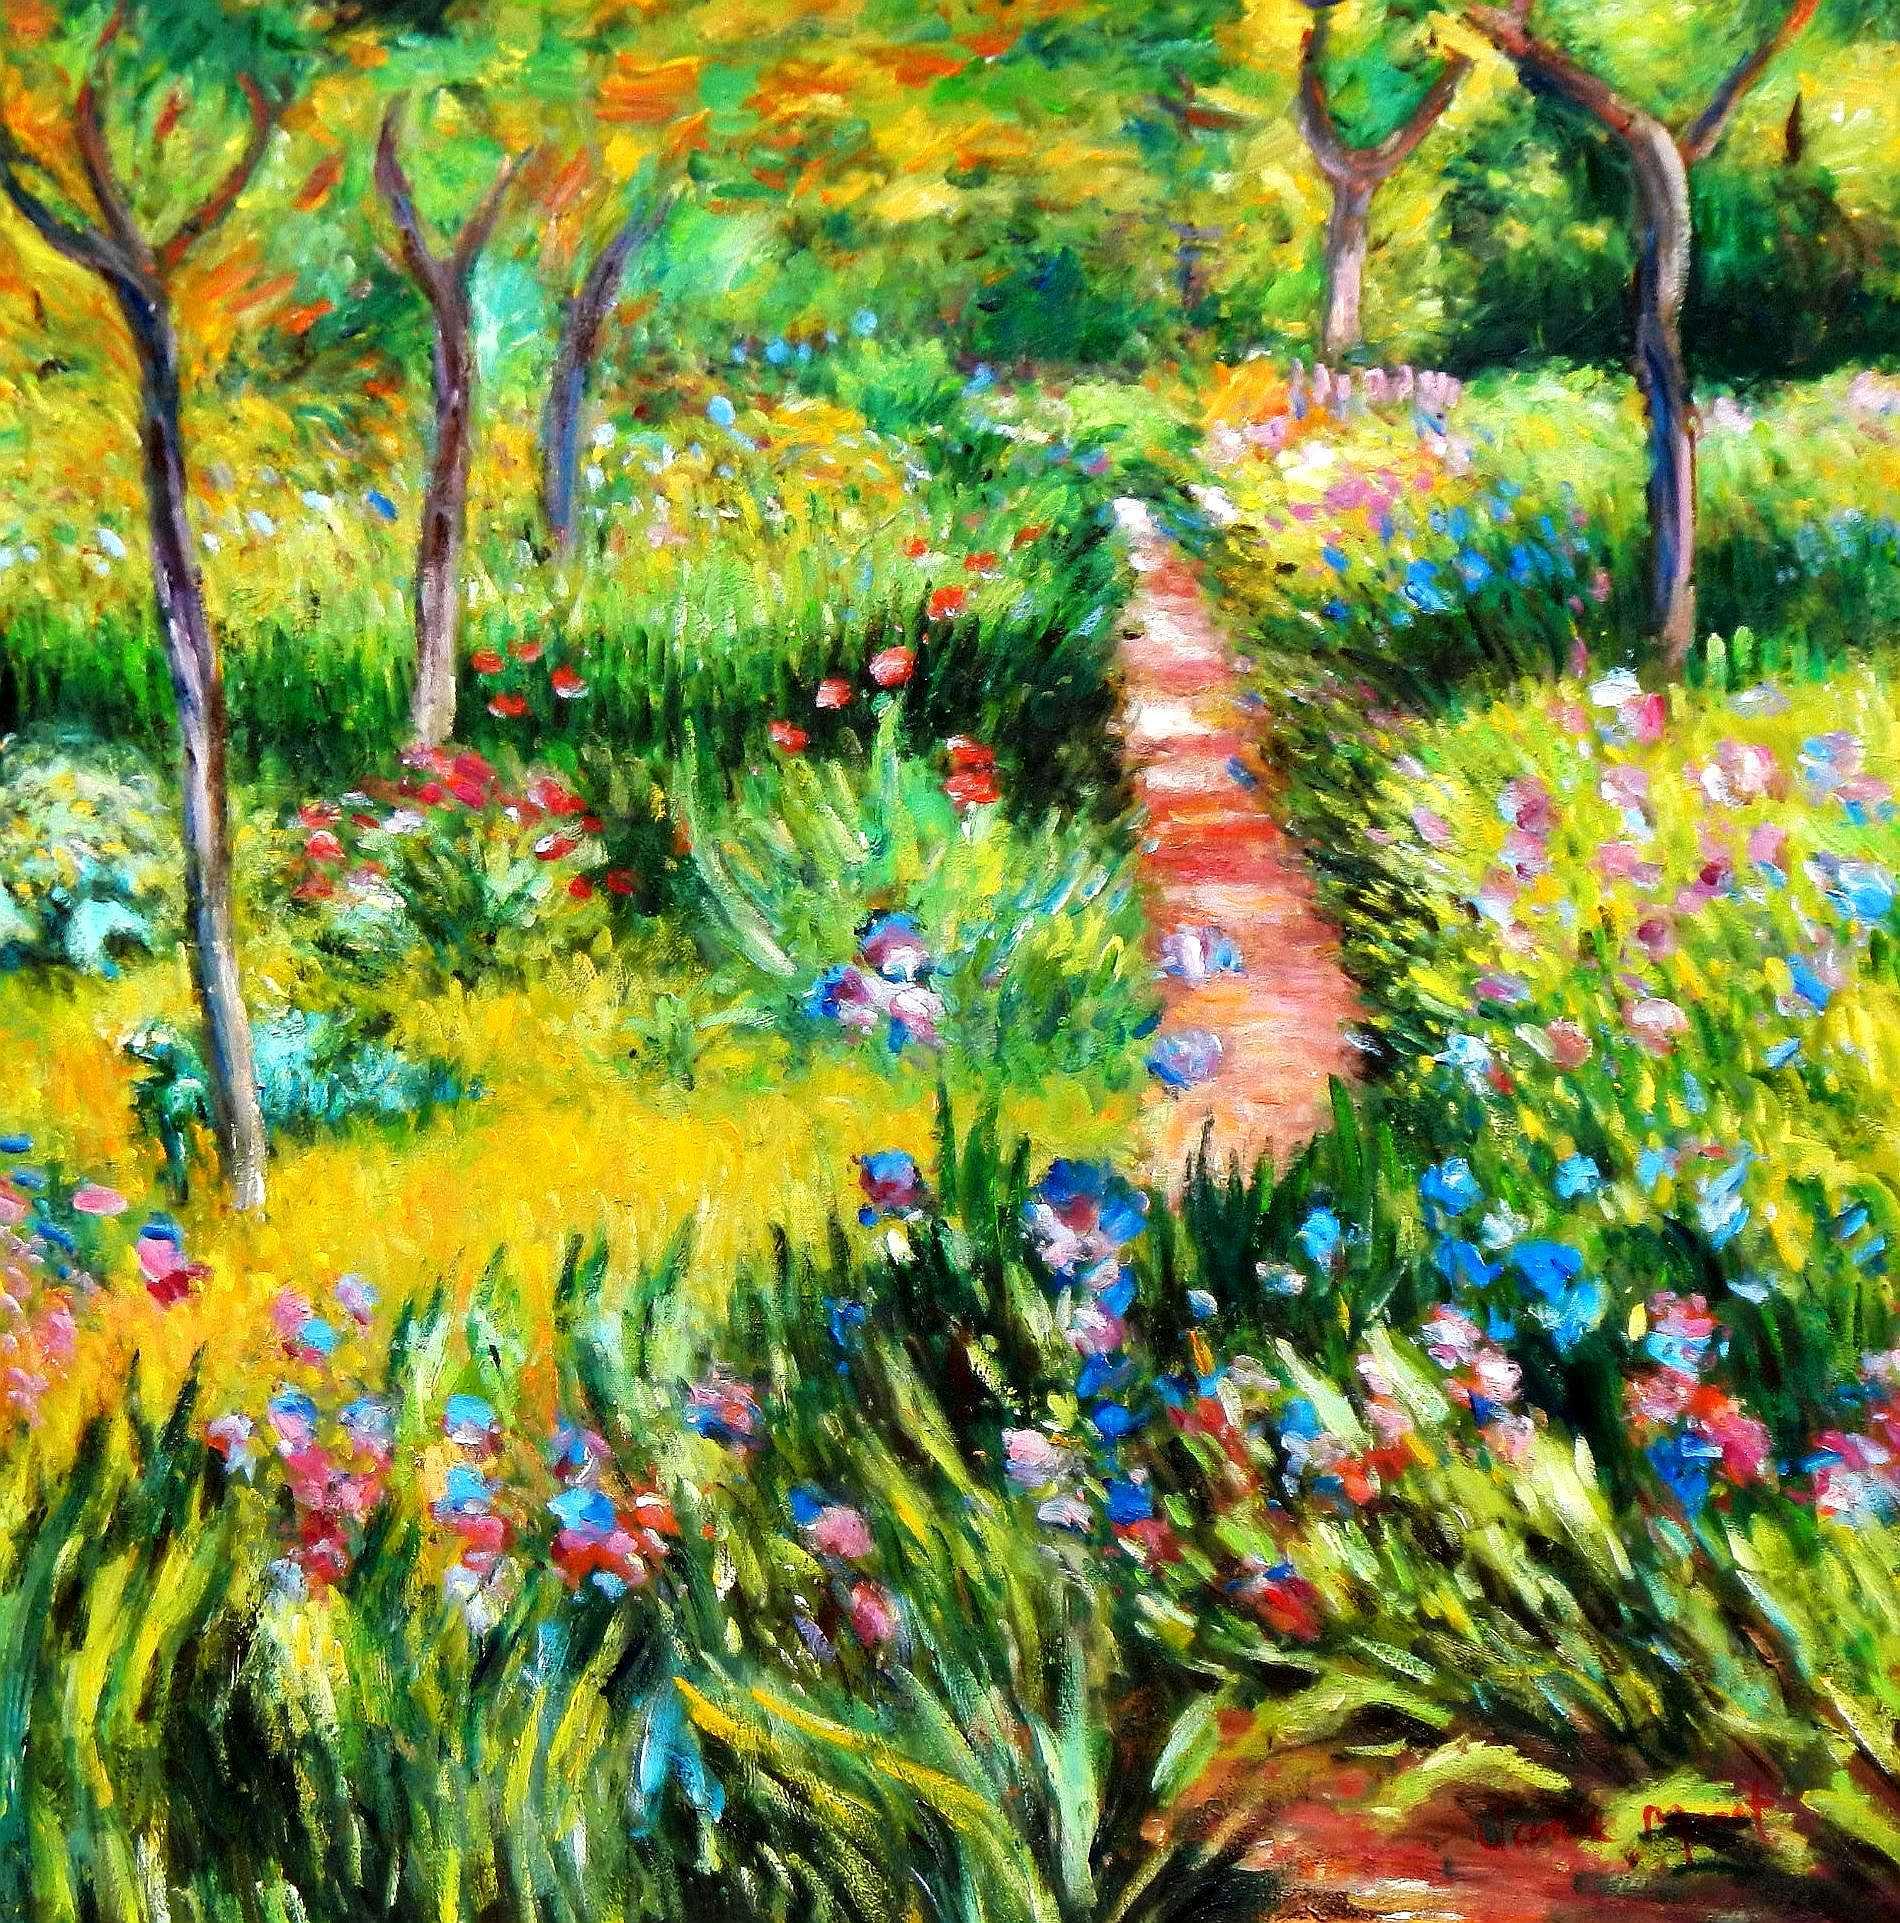 Claude Monet - Monet´s Garten in Giverny g95248 80x80cm exzellentes Ölgemälde